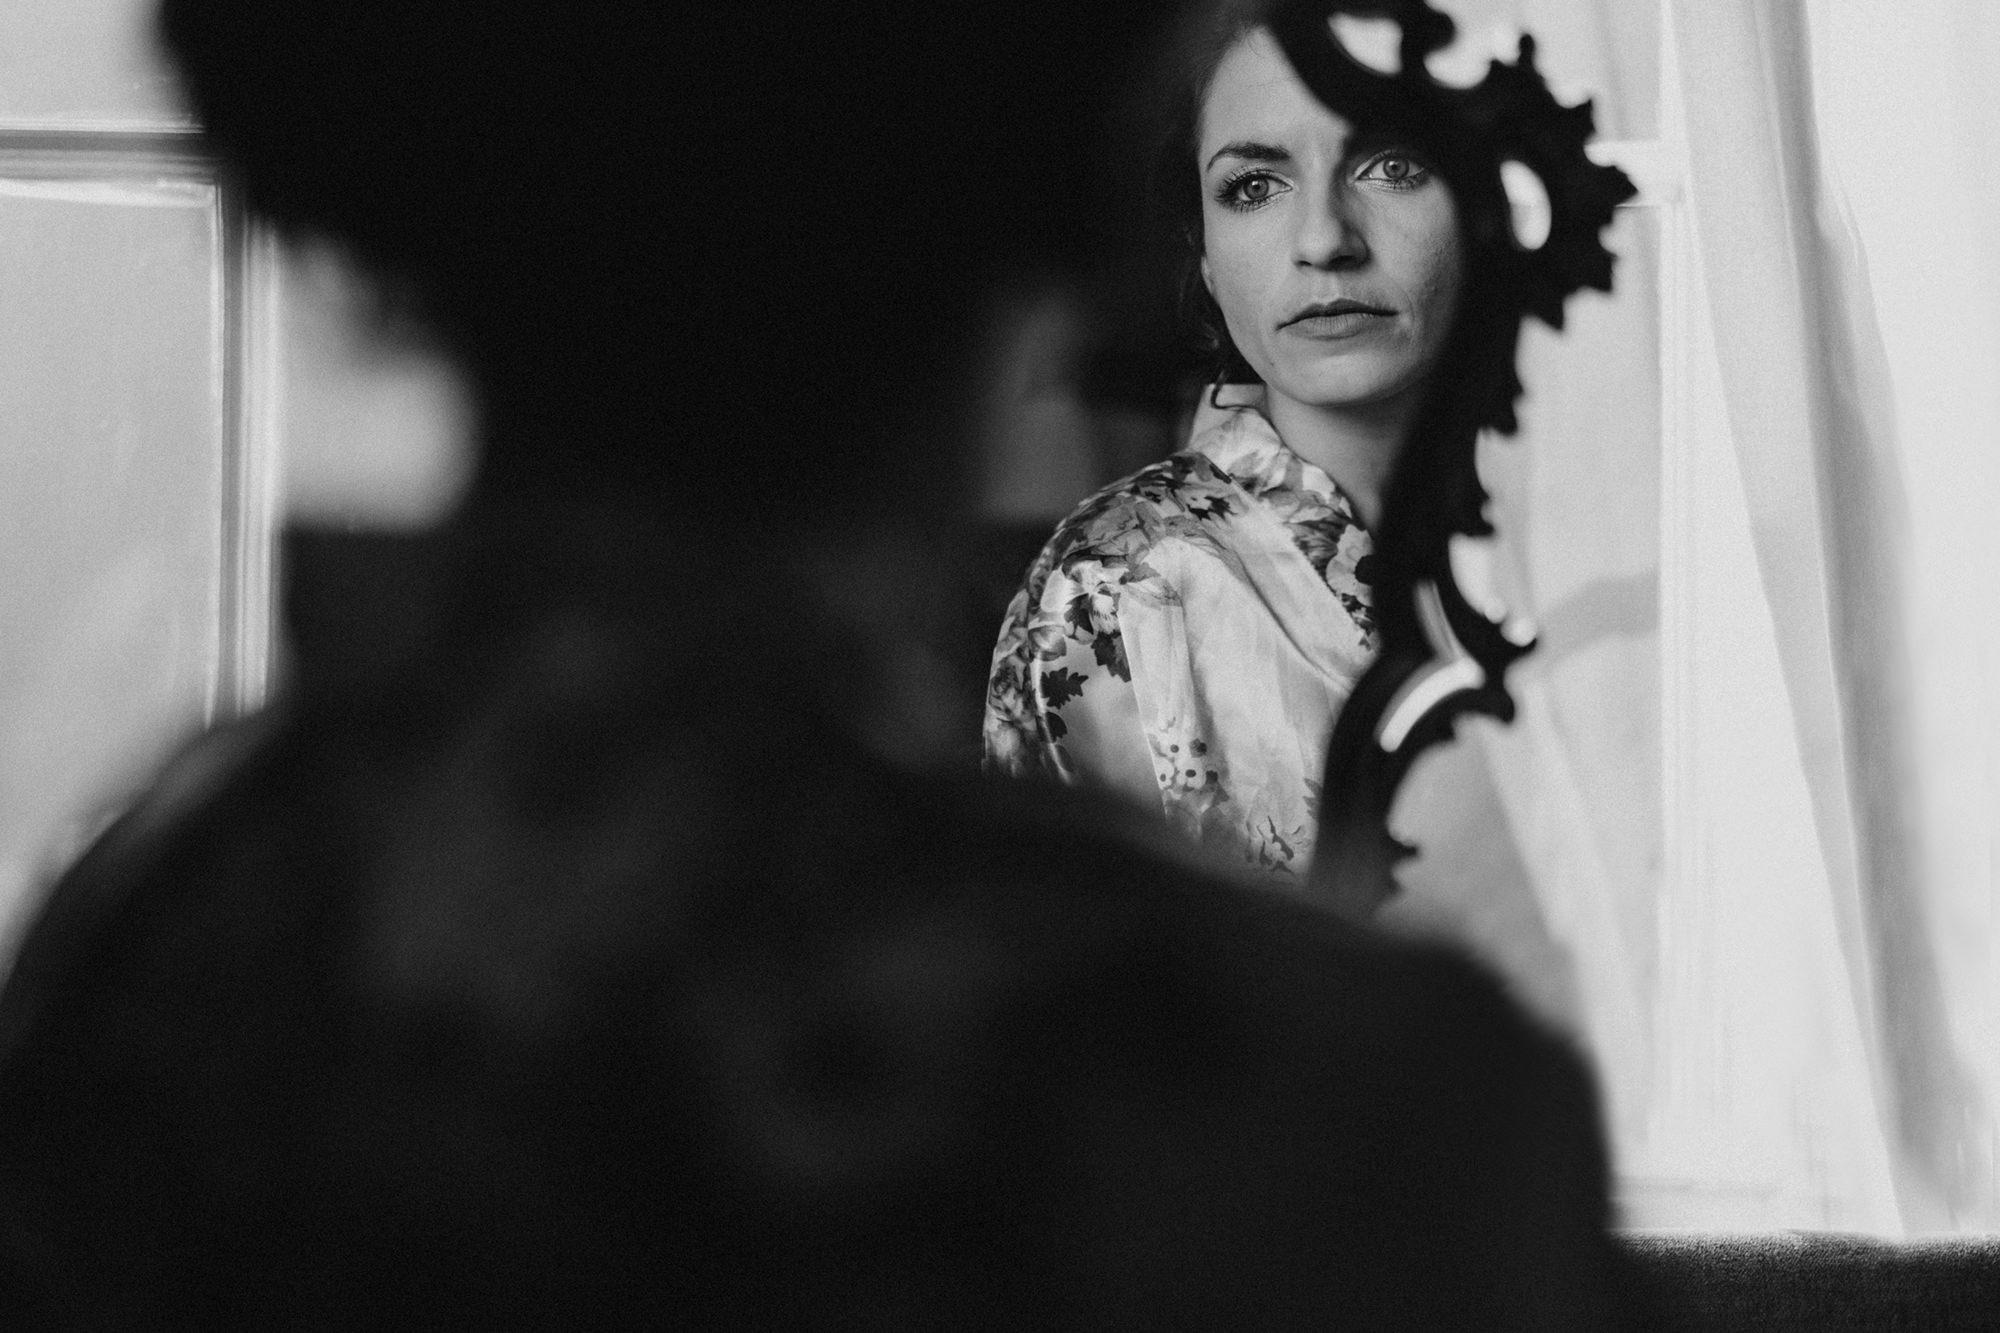 Wedding_N+R_Alsace_Morimont_neupapphotography-254.jpg